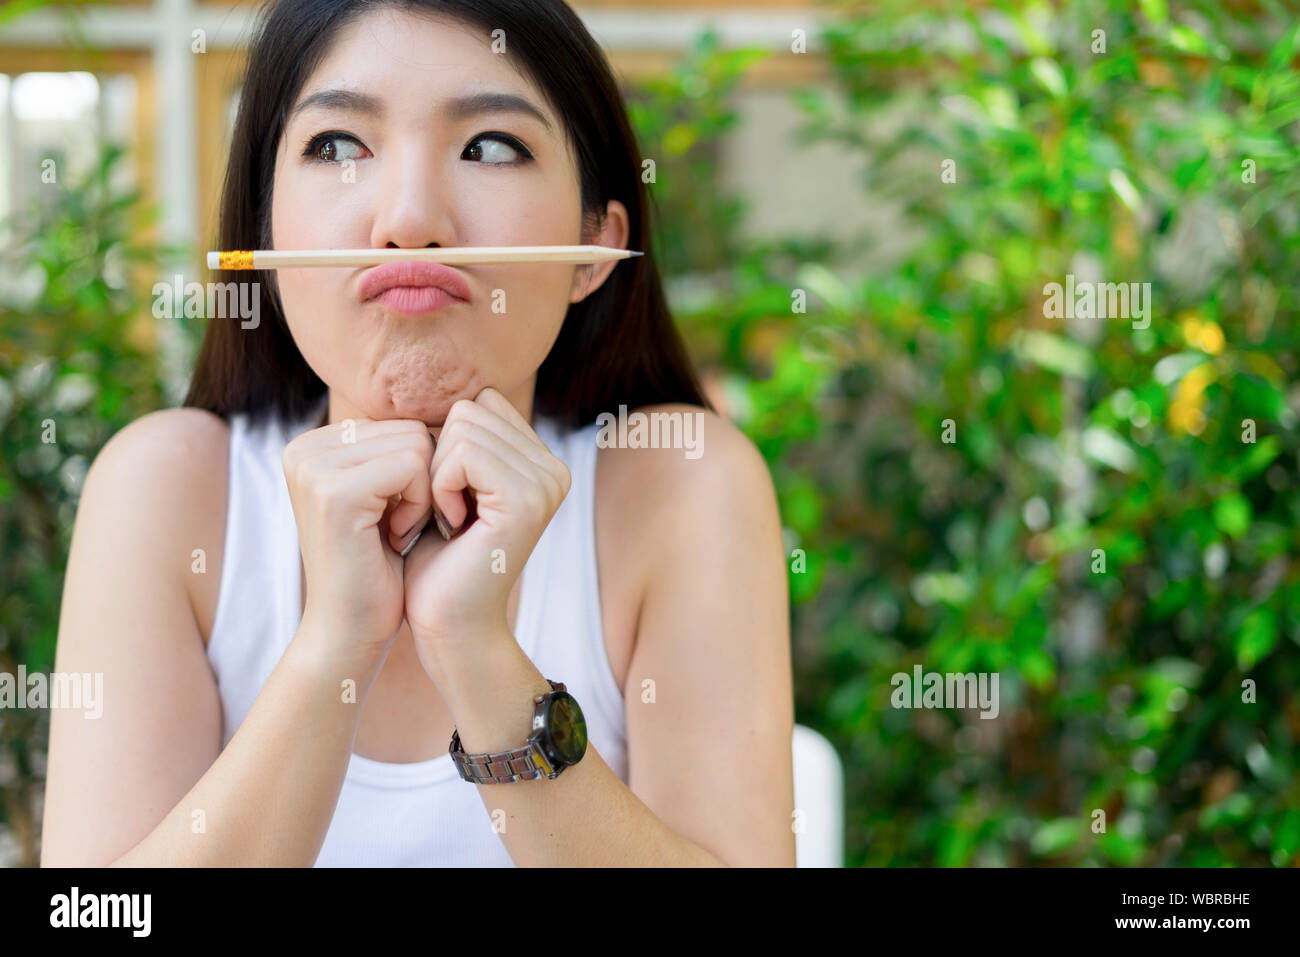 Close-up Of Playful Young Woman Balancing Pencil On Lips Stock Photo